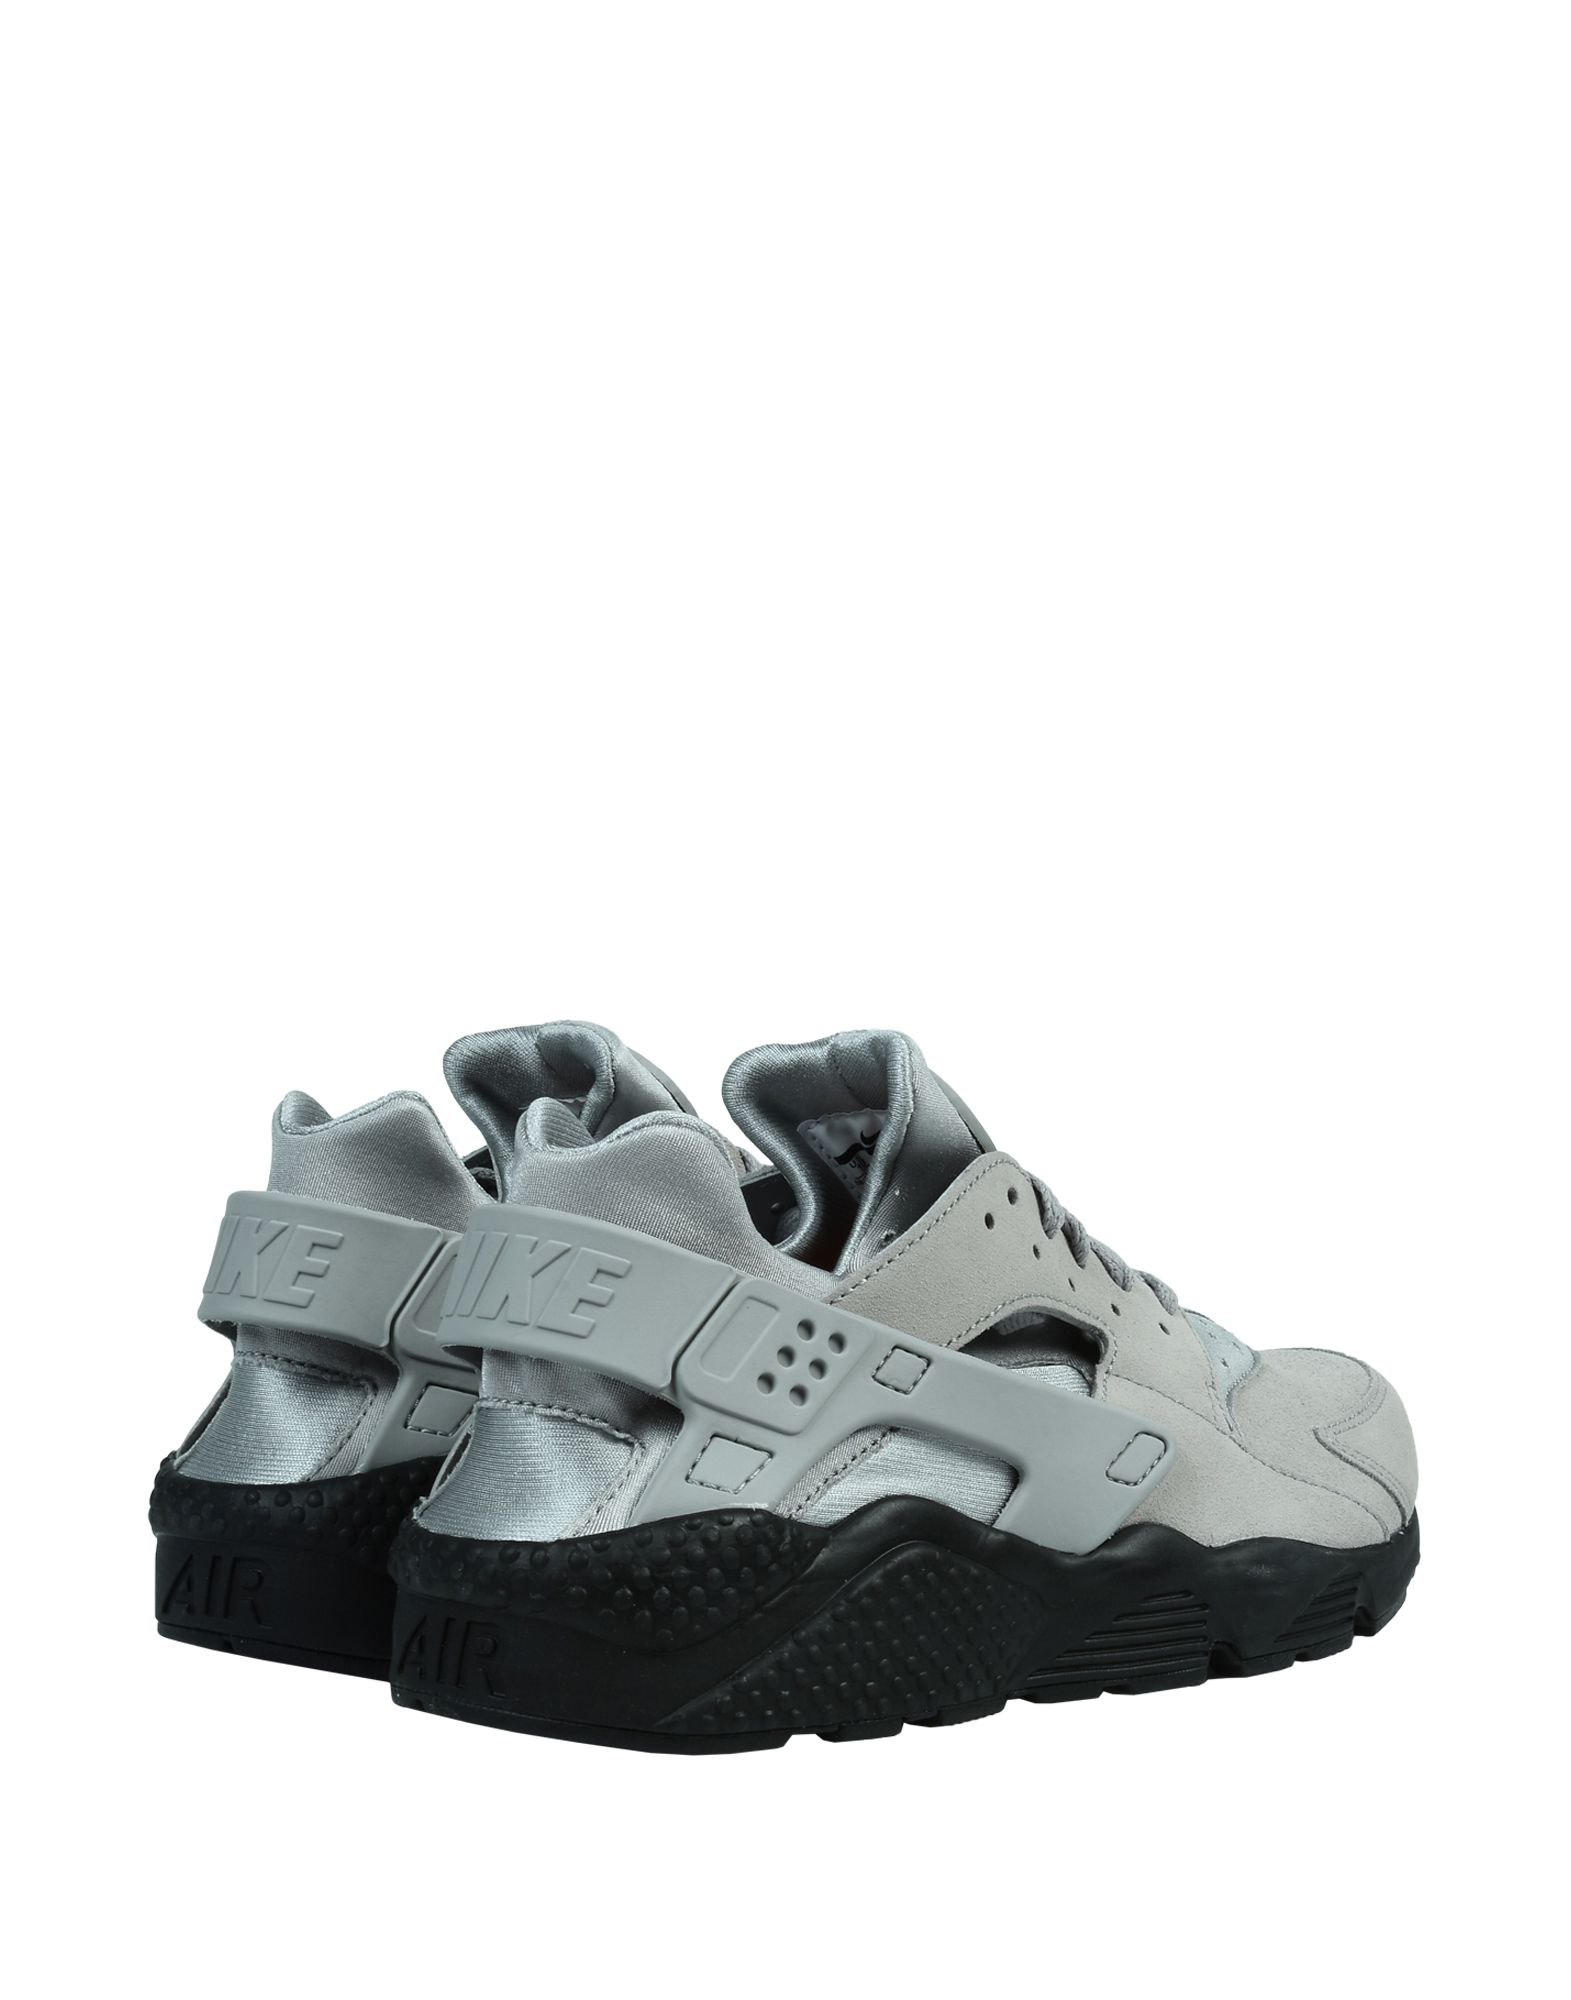 Sneakers Nike Air Huarache Run Se - Homme - Sneakers Nike sur